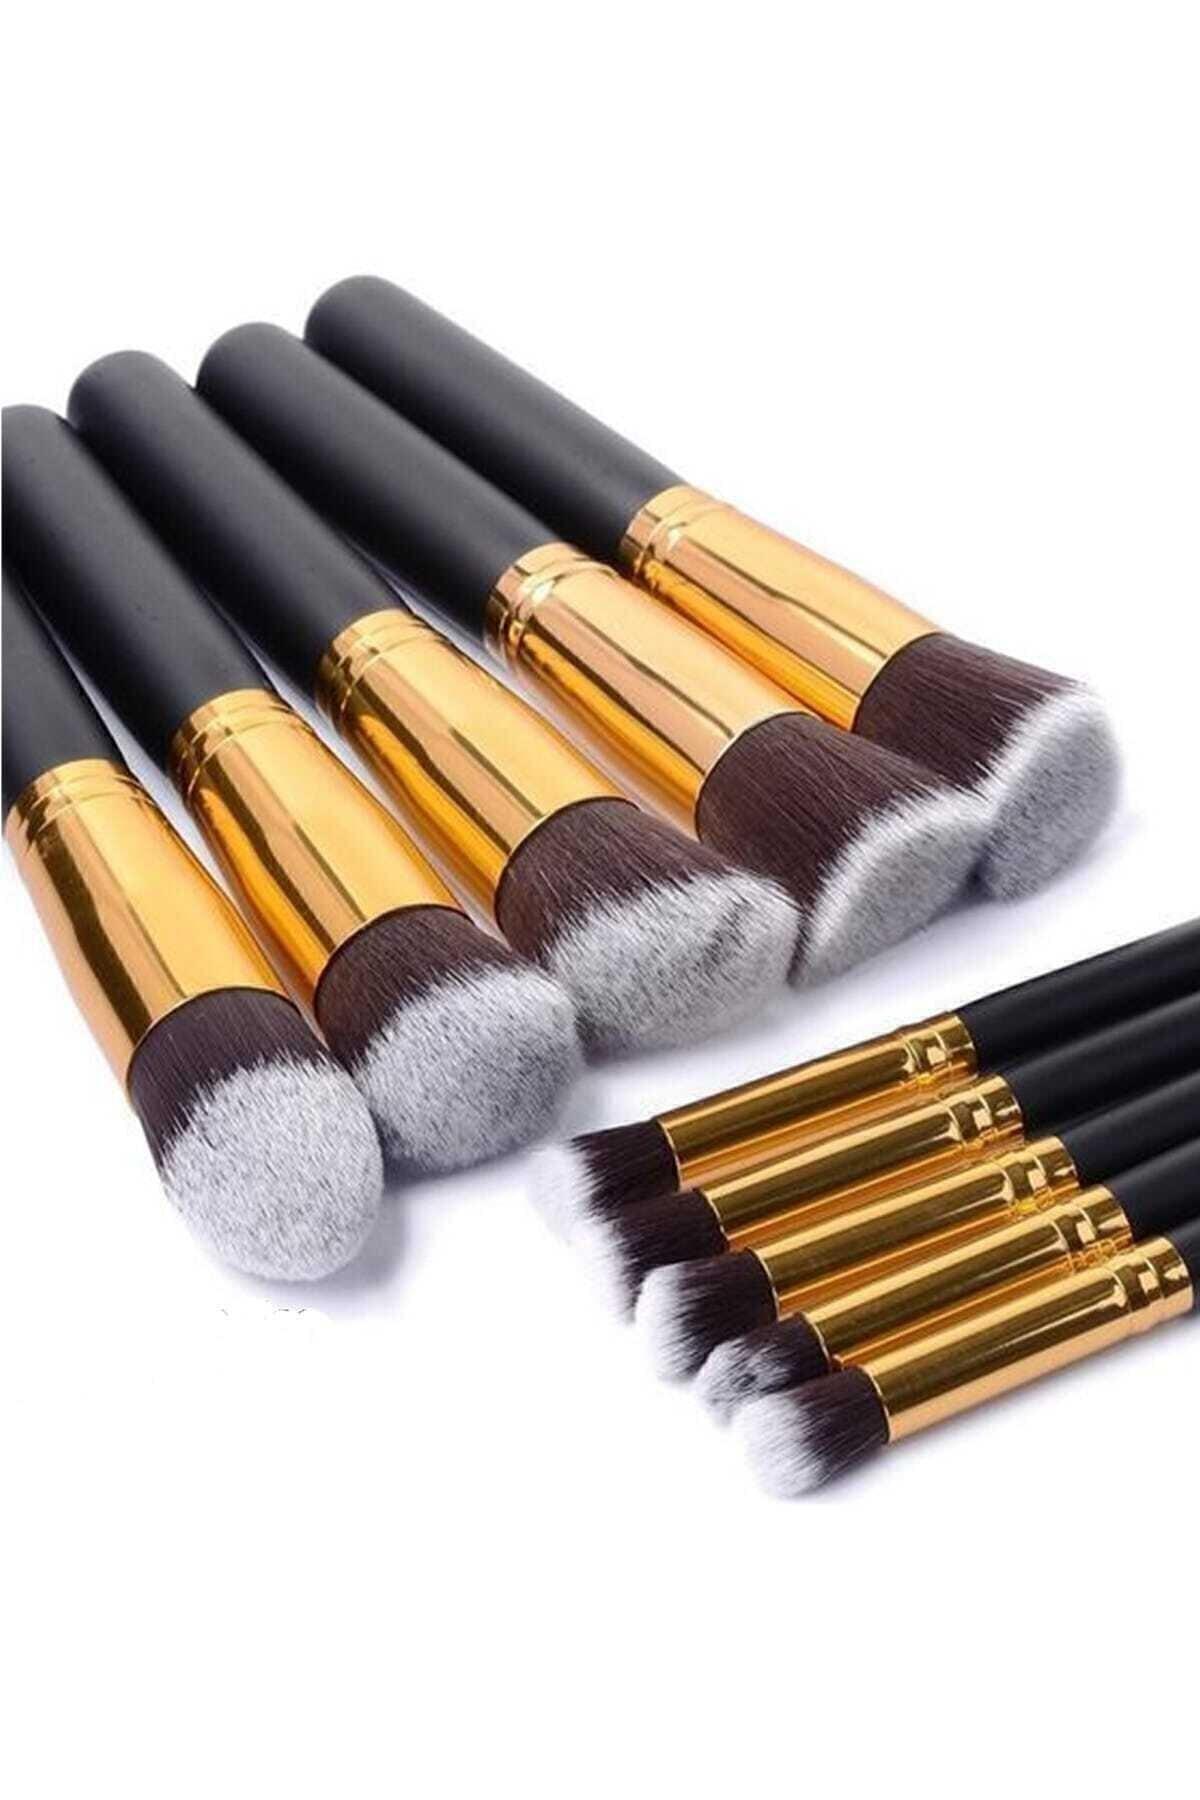 Gold Beauty Siyah Artskin Makyaj Fırça Seti 10'lu 1